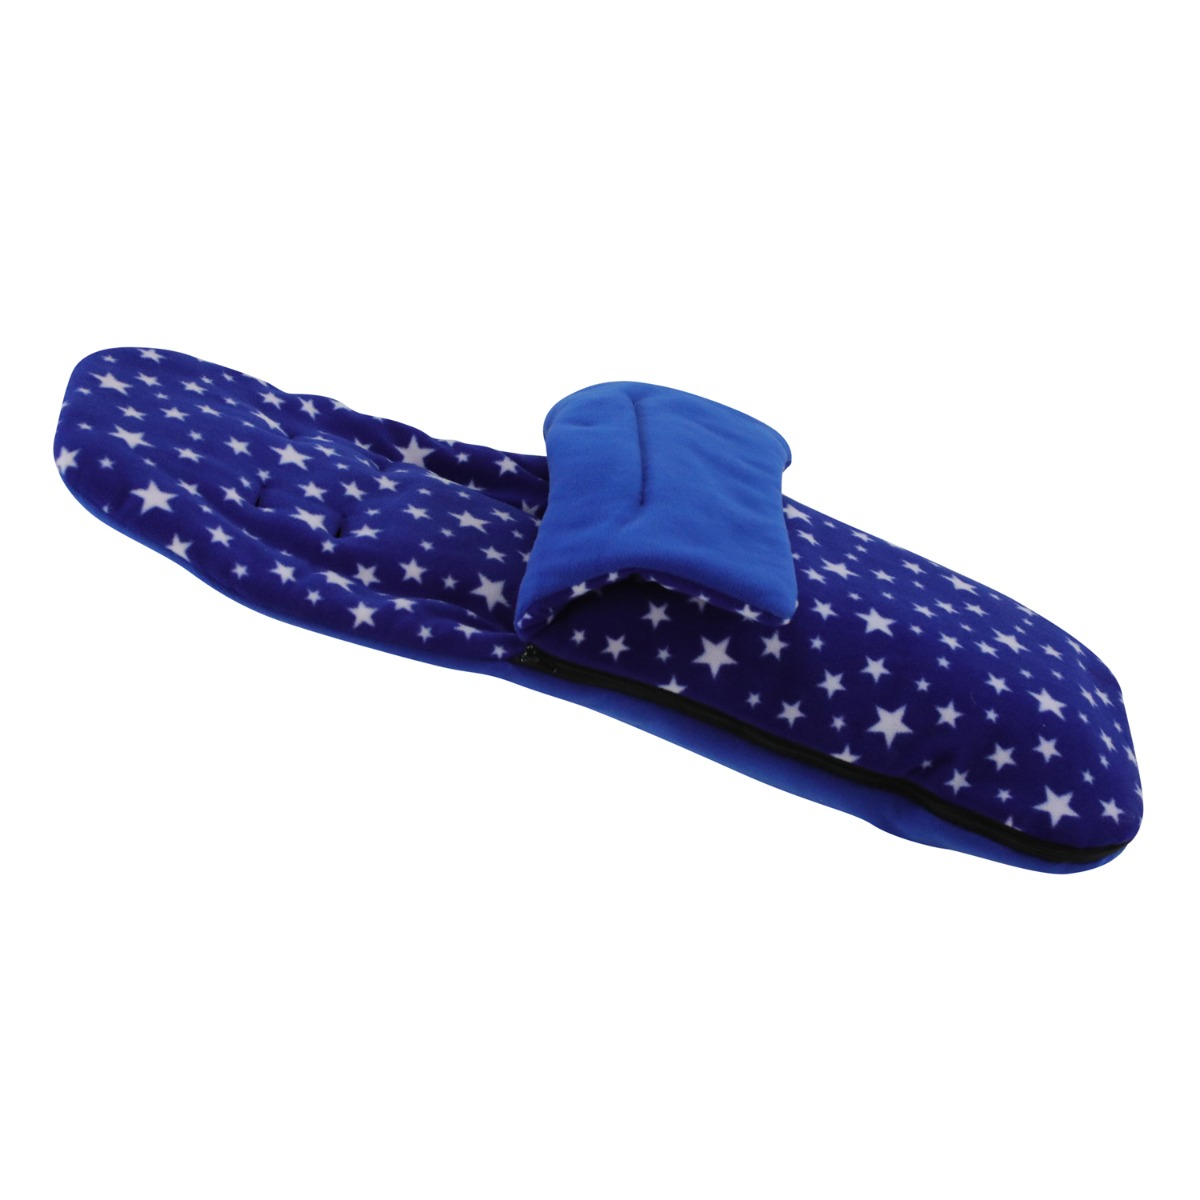 Premium Footmuff Cosy Toes Compatible with Emmaljunga